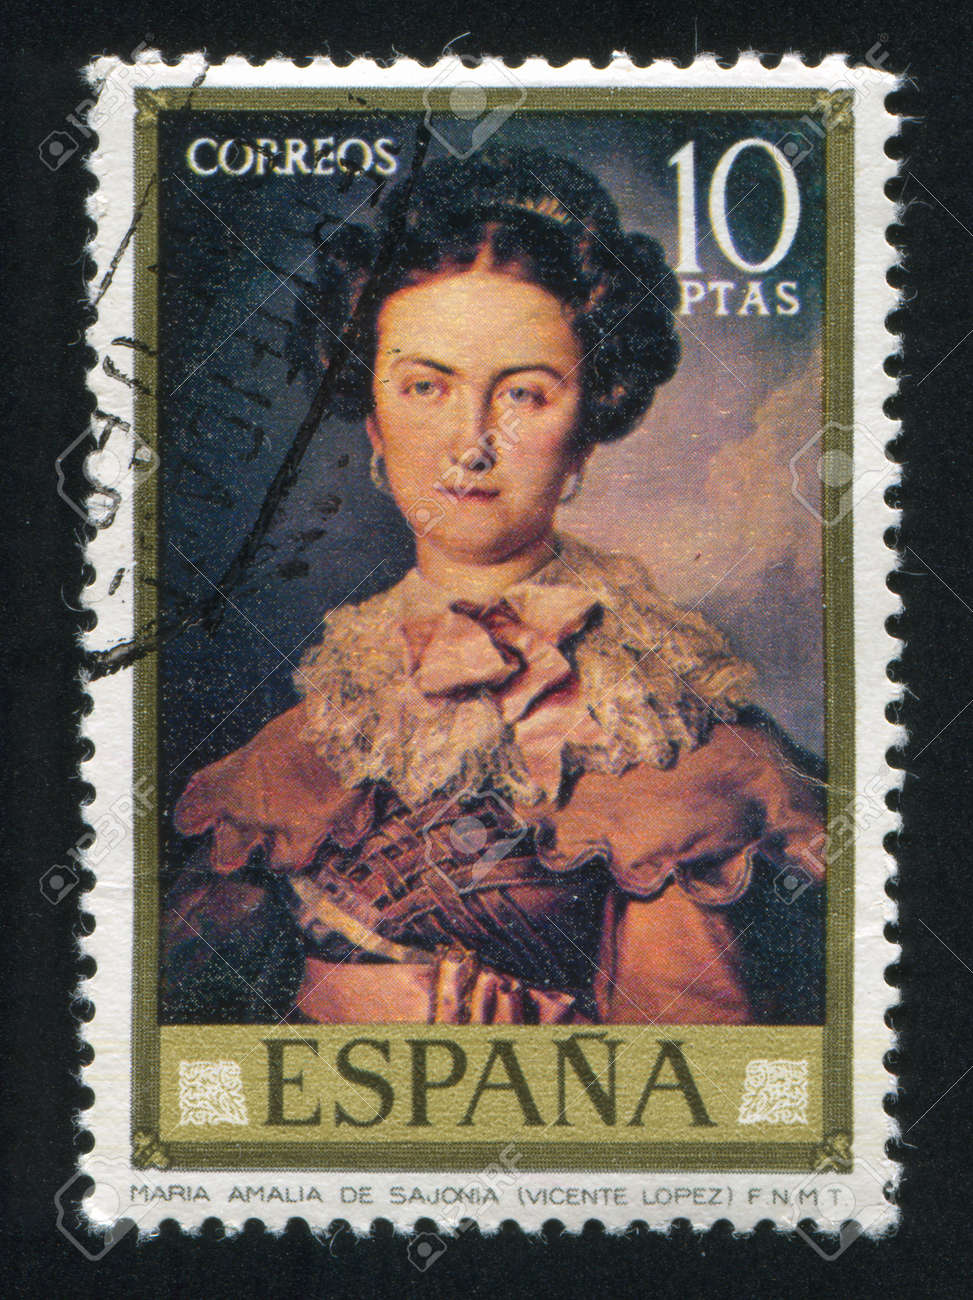 SPAIN - CIRCA 1973: stamp printed by Spain, shows Maria Amalia de Sajonia (Vicente Lopez), circa 1973 Stock Photo - 16223857